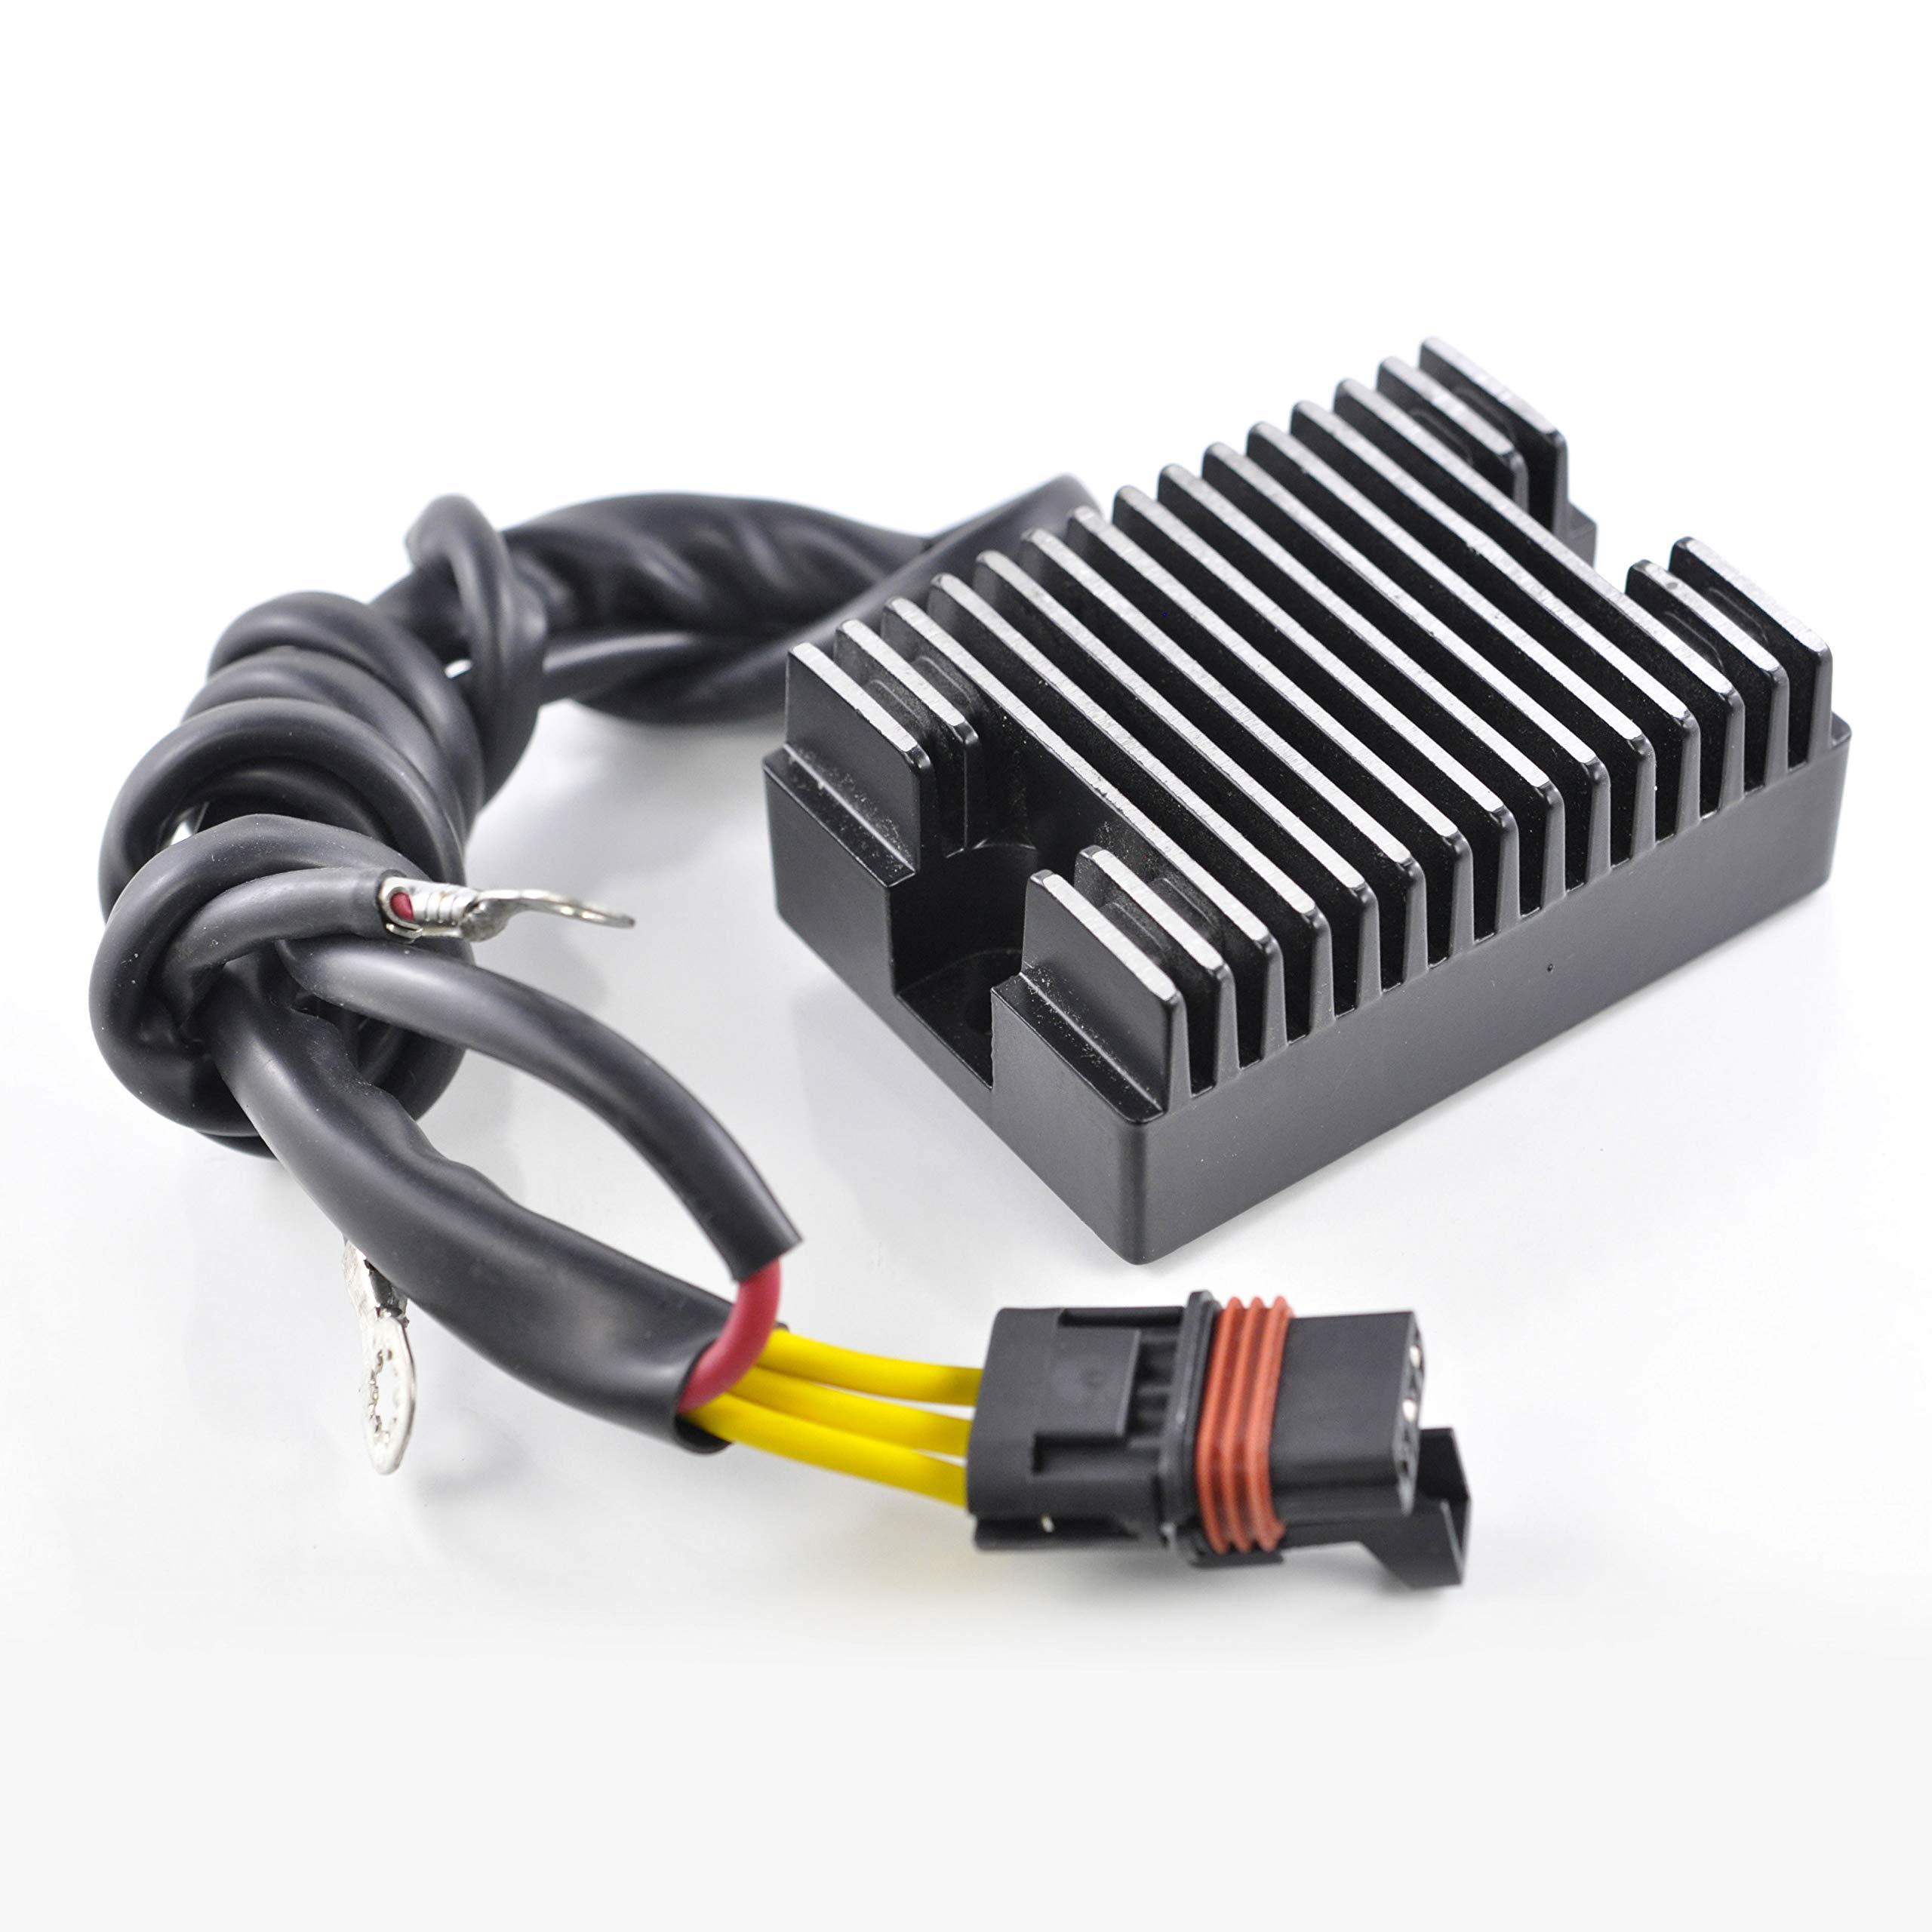 Mosfet Voltage Regulator Rectifier For Victory V92C Cruiser / V92C Deluxe Cruiser / V92SC Sport Cruiser 2001 OEM Repl.# 2410209